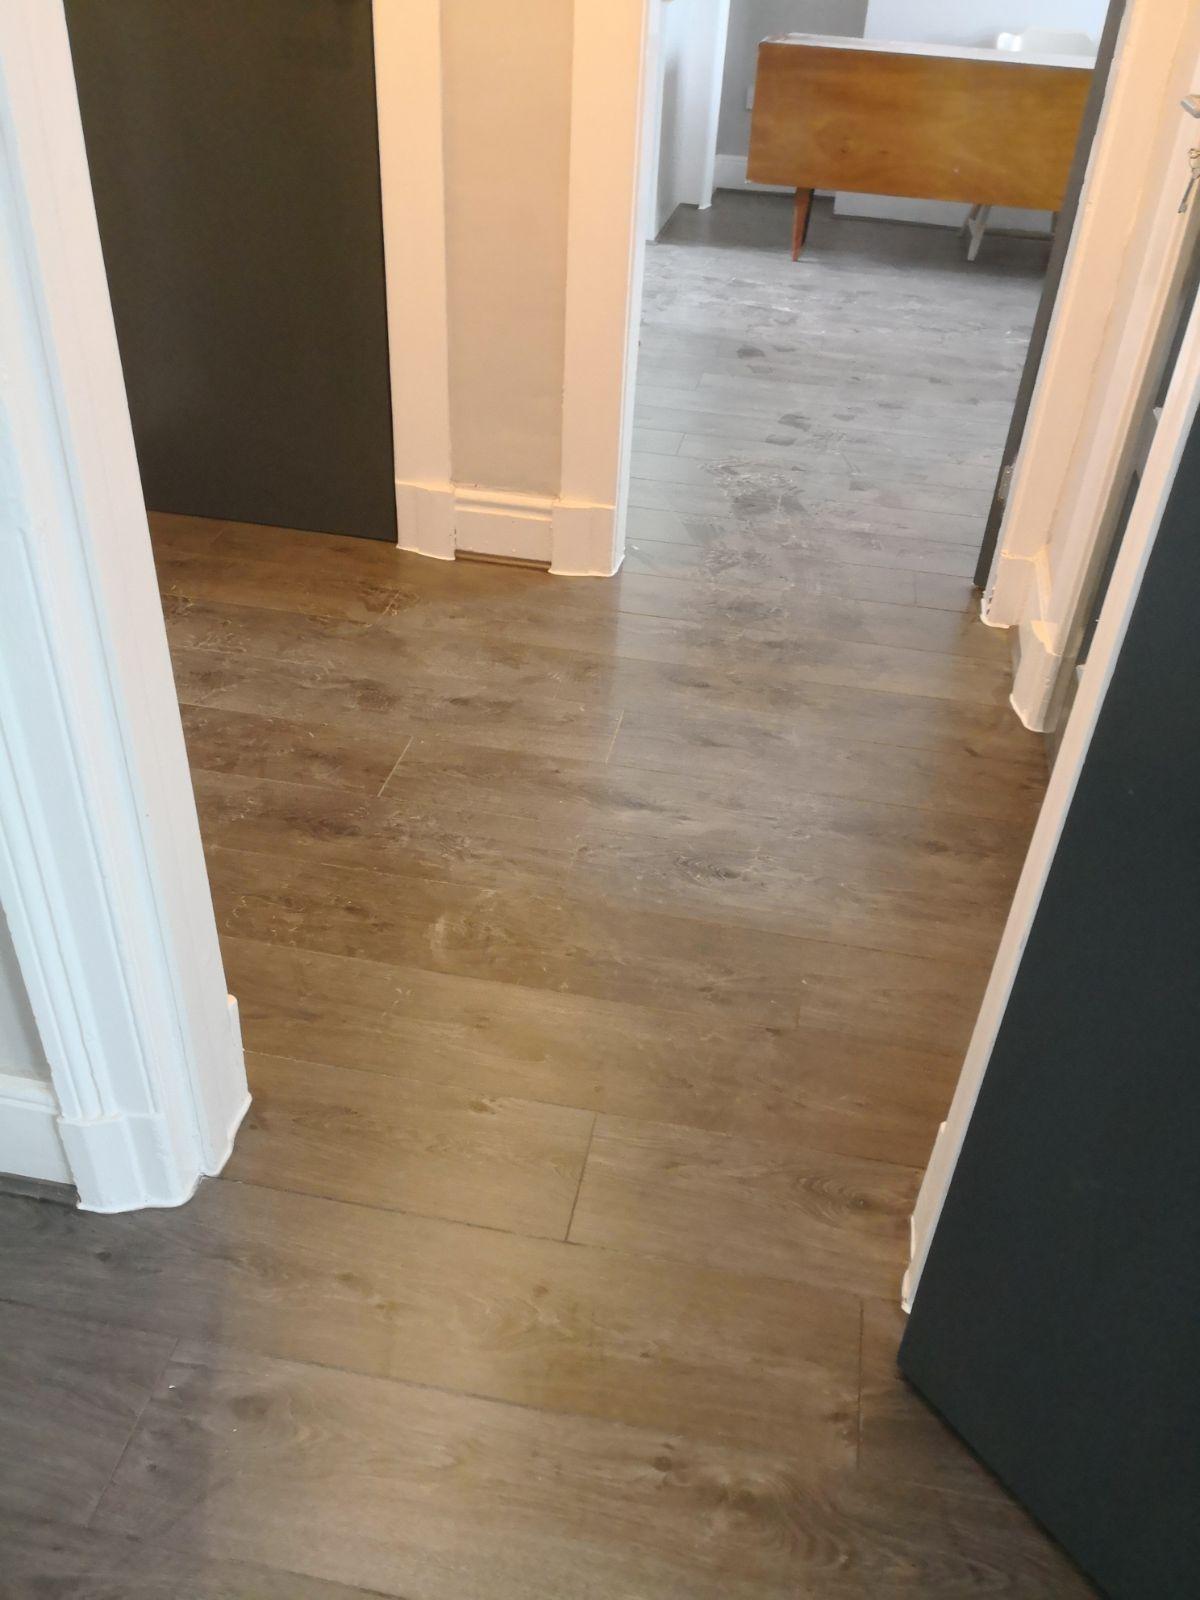 The Carpet Southport Lifestyle Chelsea Boardwalk Oak Laminate Flooring